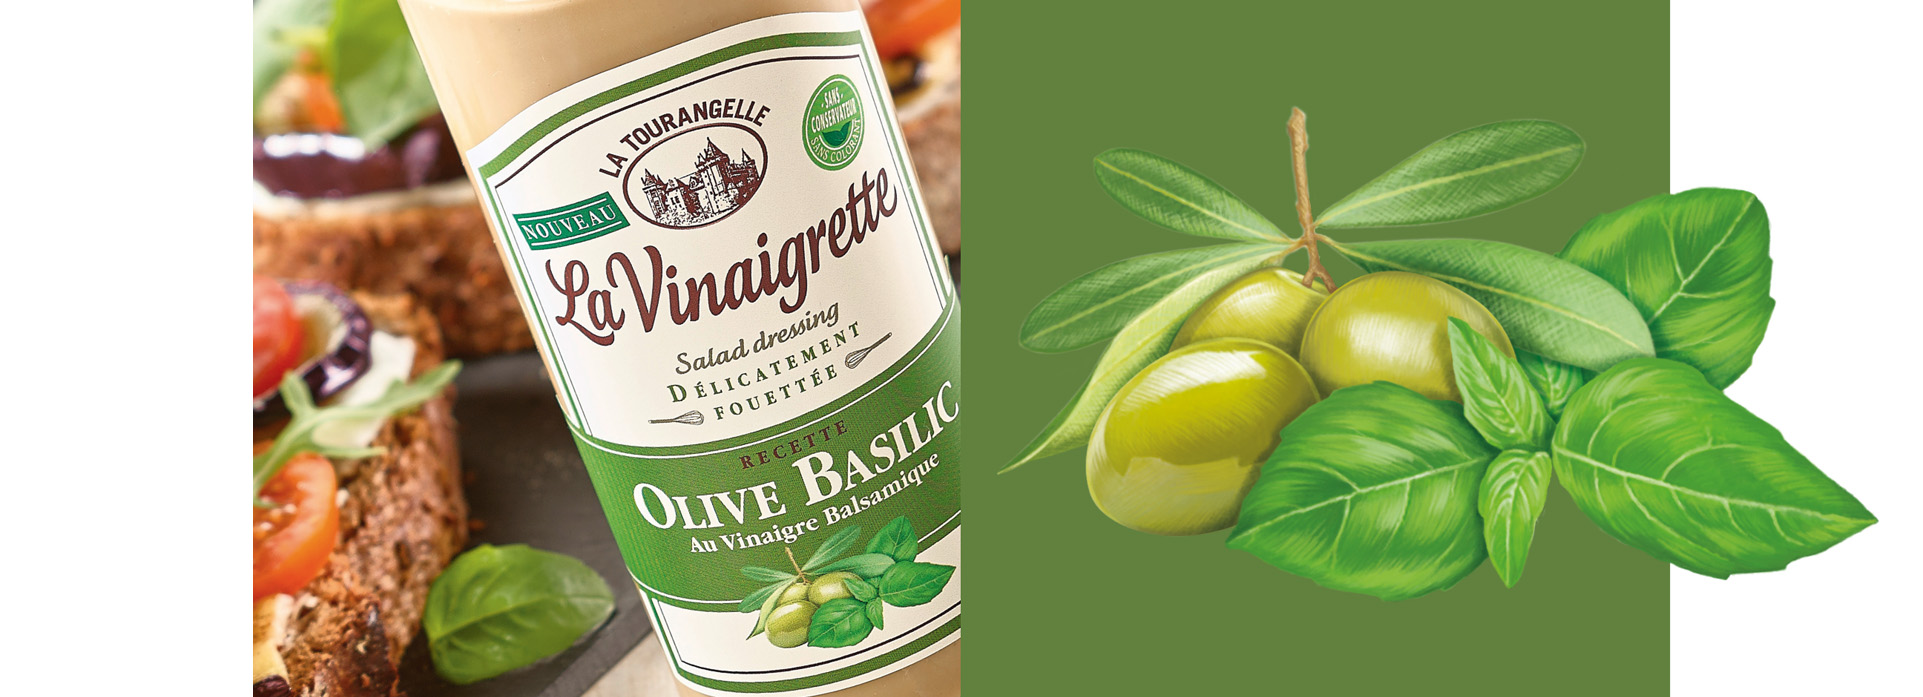 olive basilic Vinaigrette packaging la tourangelle VIKIU